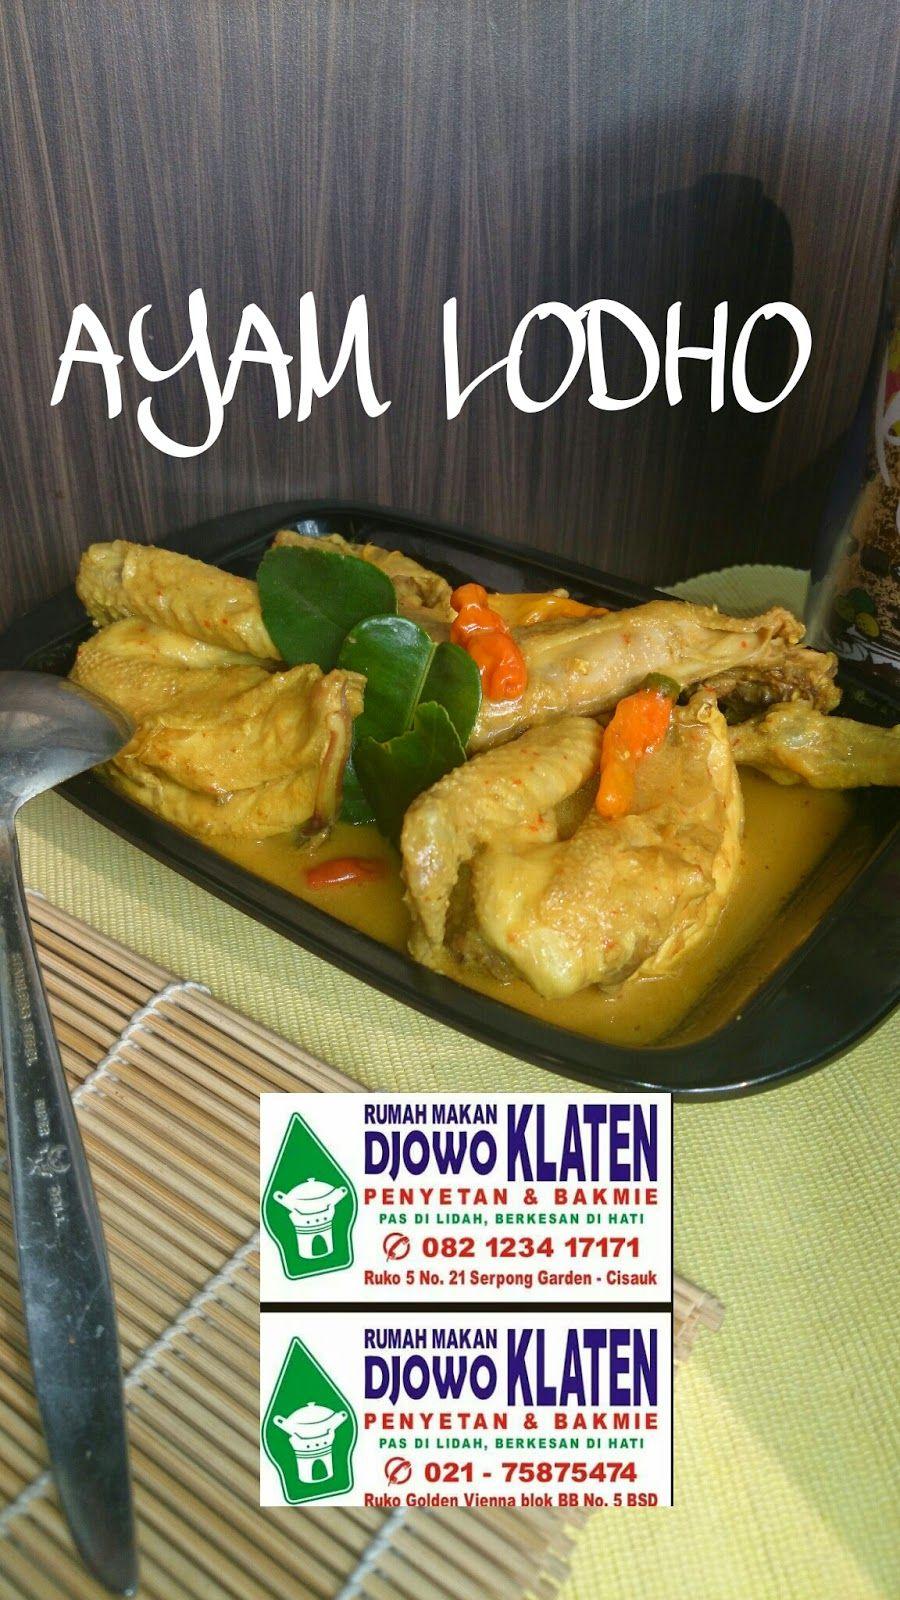 Rumah Makan Djowo Klaten Ayam Lodho Ayam Makanan Resep Masakan